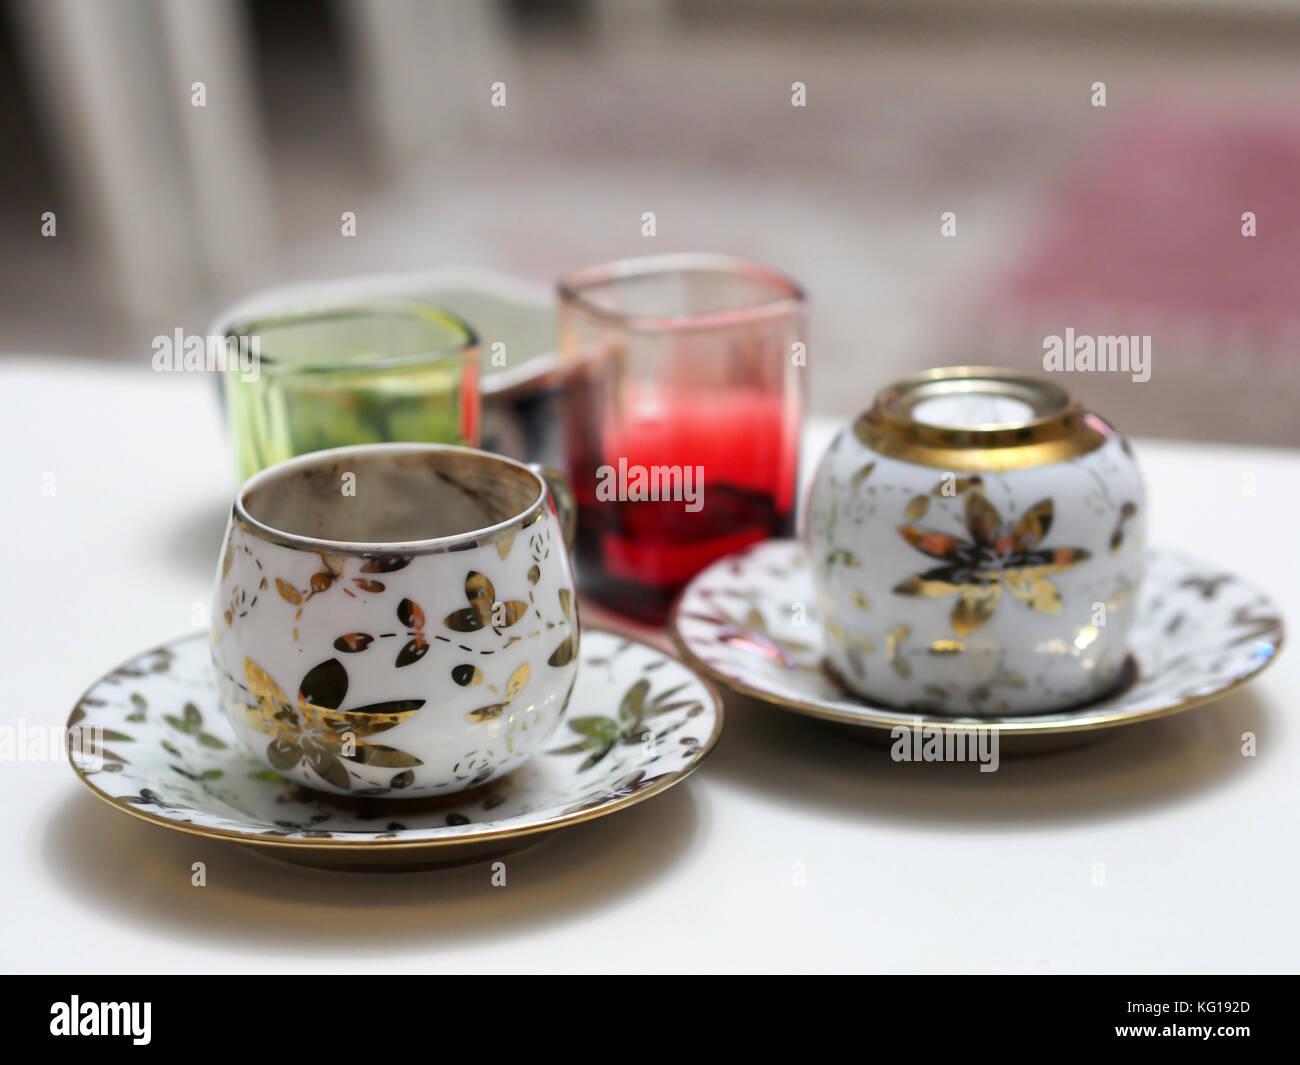 Turkish coffee cup stock photos turkish coffee cup stock images turkish coffee cup and coffee fal on table stock image buycottarizona Image collections